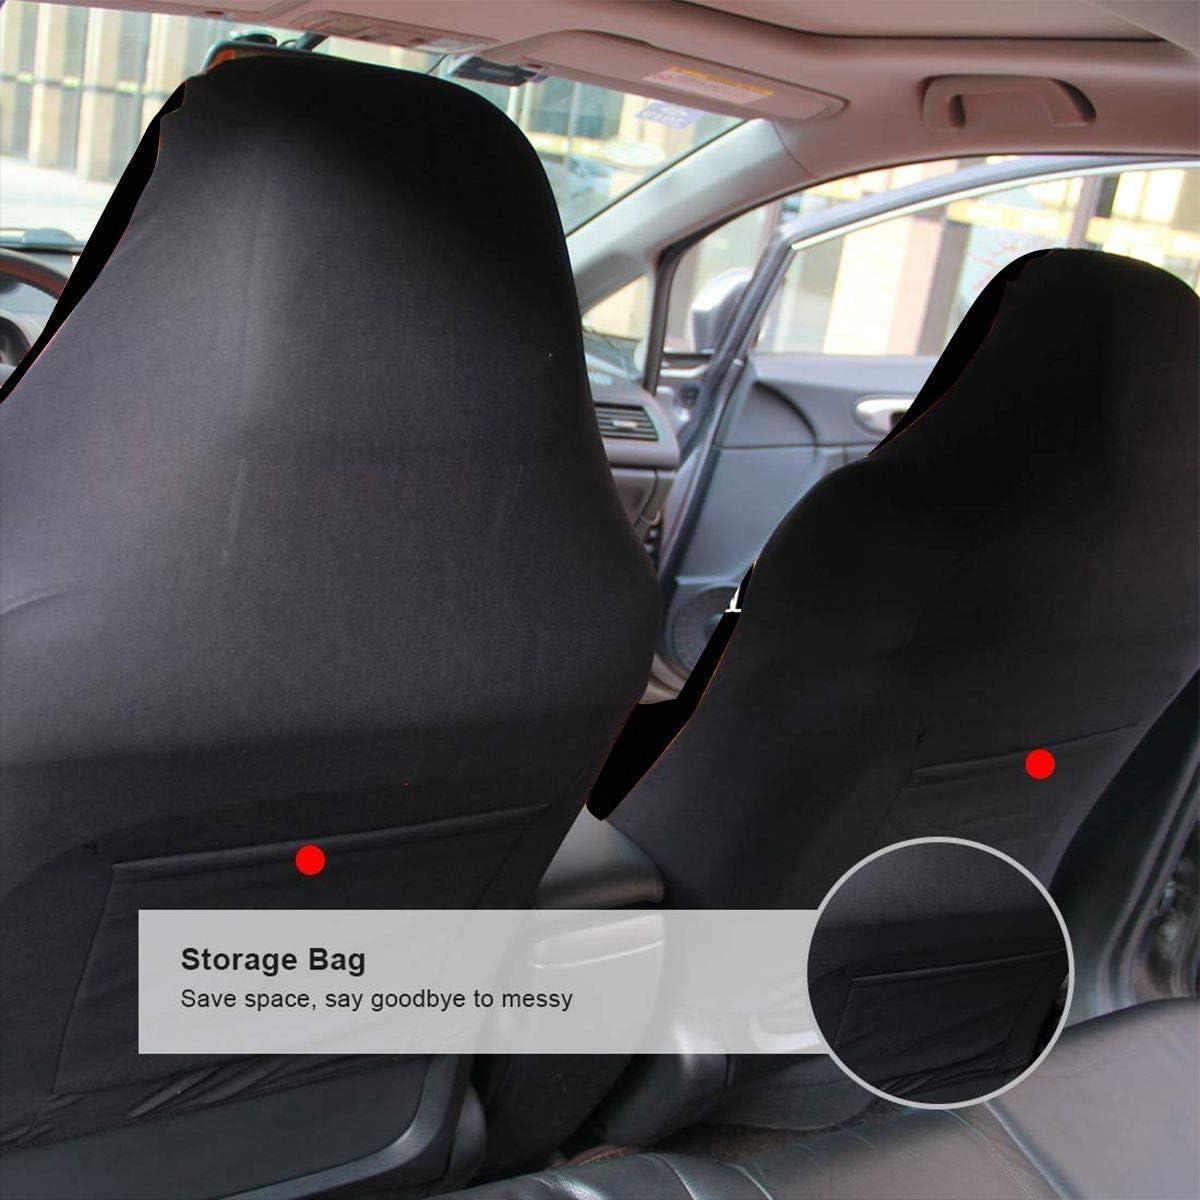 Sedan Auto Car Front Covers No Drama Llama Protector Car Mat Covers for Cars Truck SUV